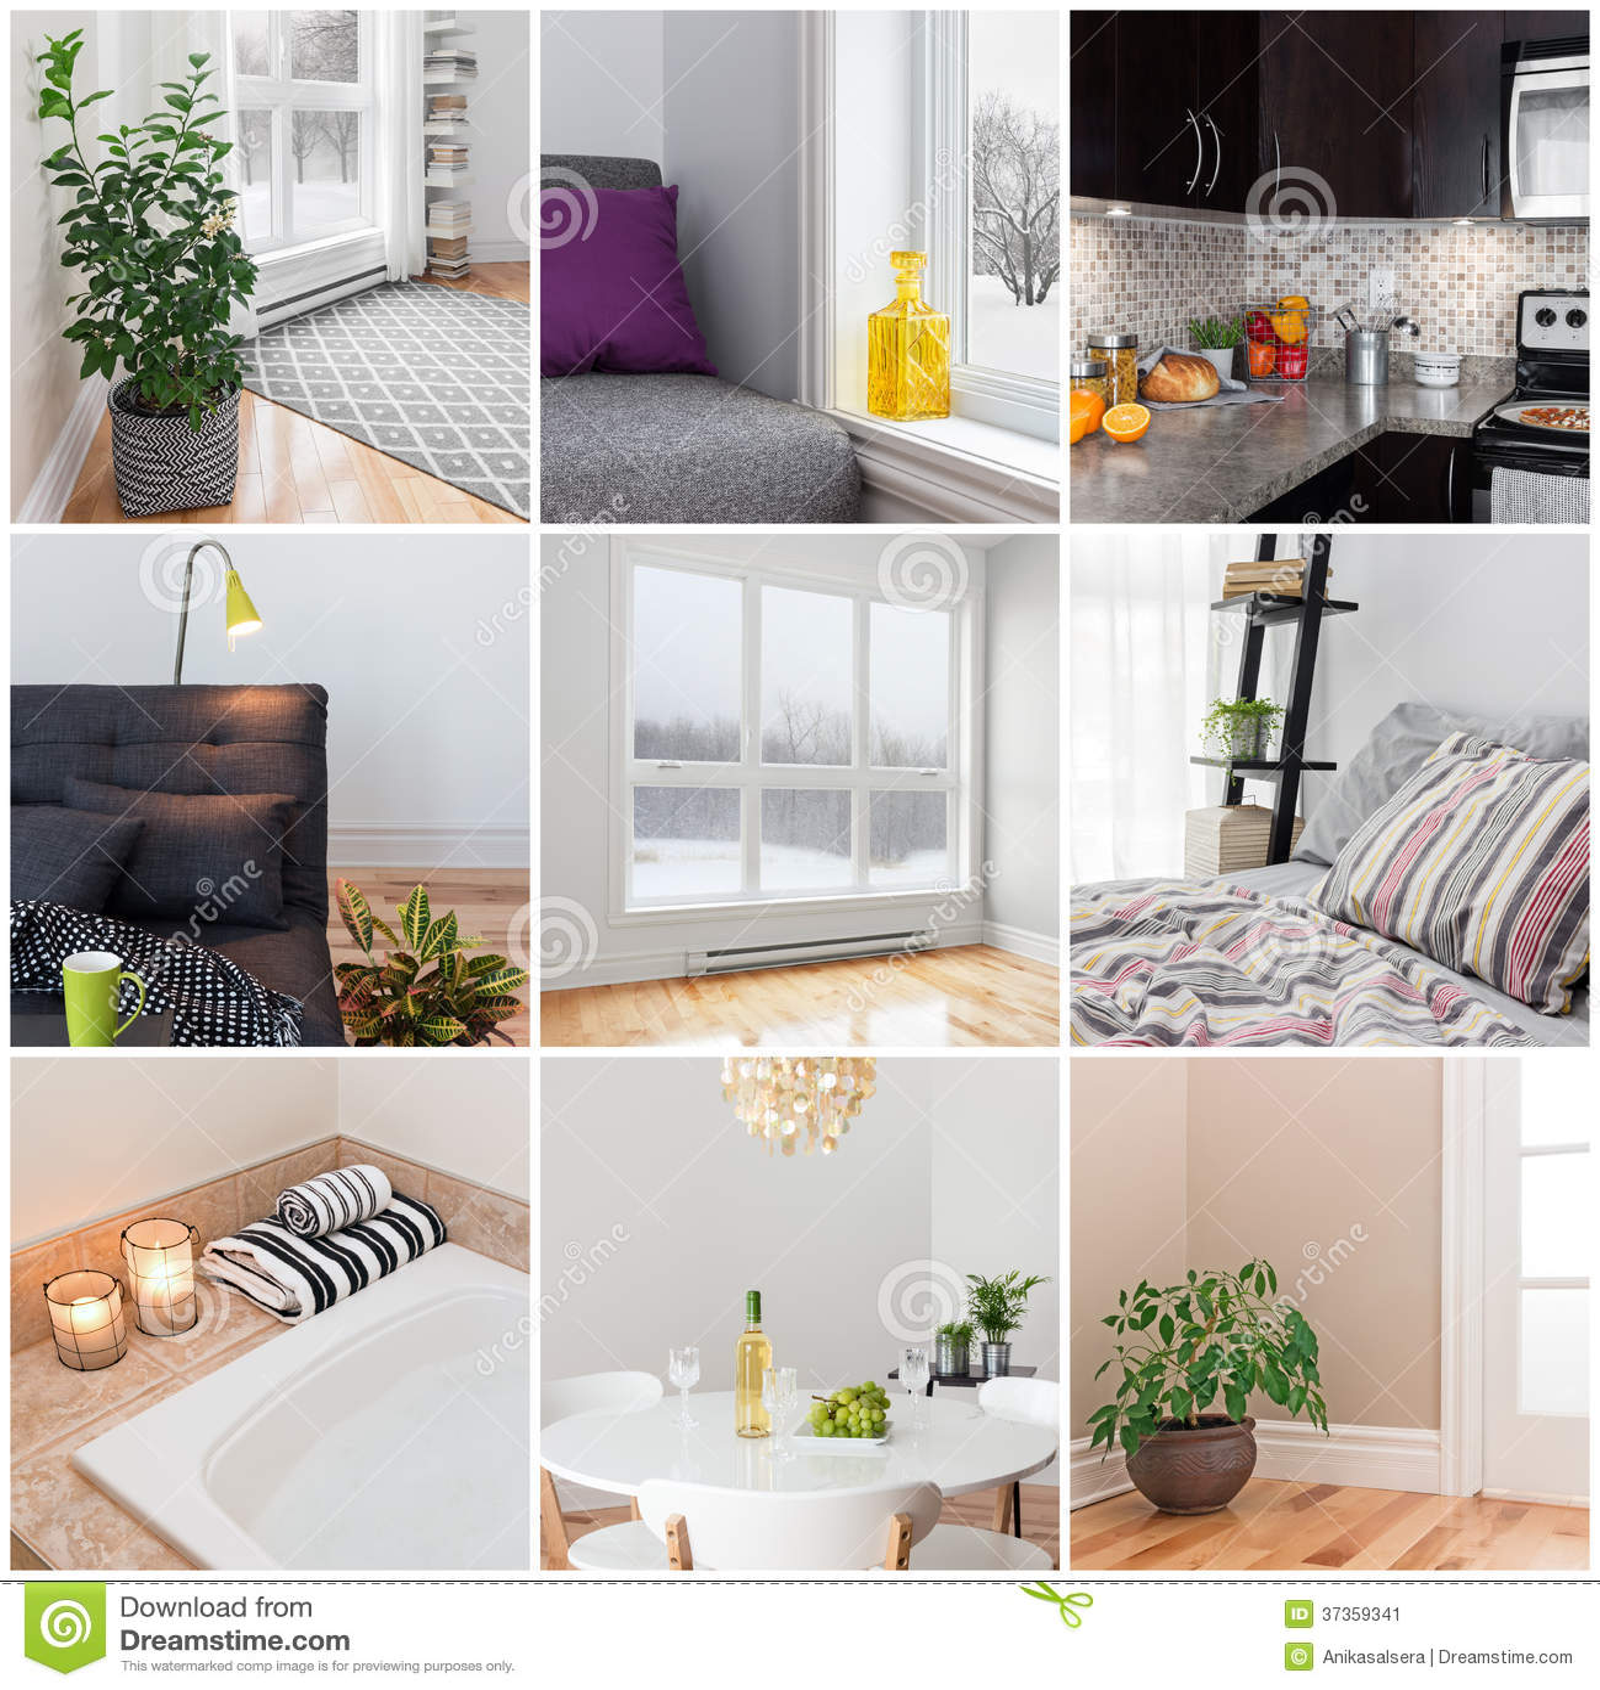 Modern home stock image image 37359341 for Living room bedroom bathroom kitchen